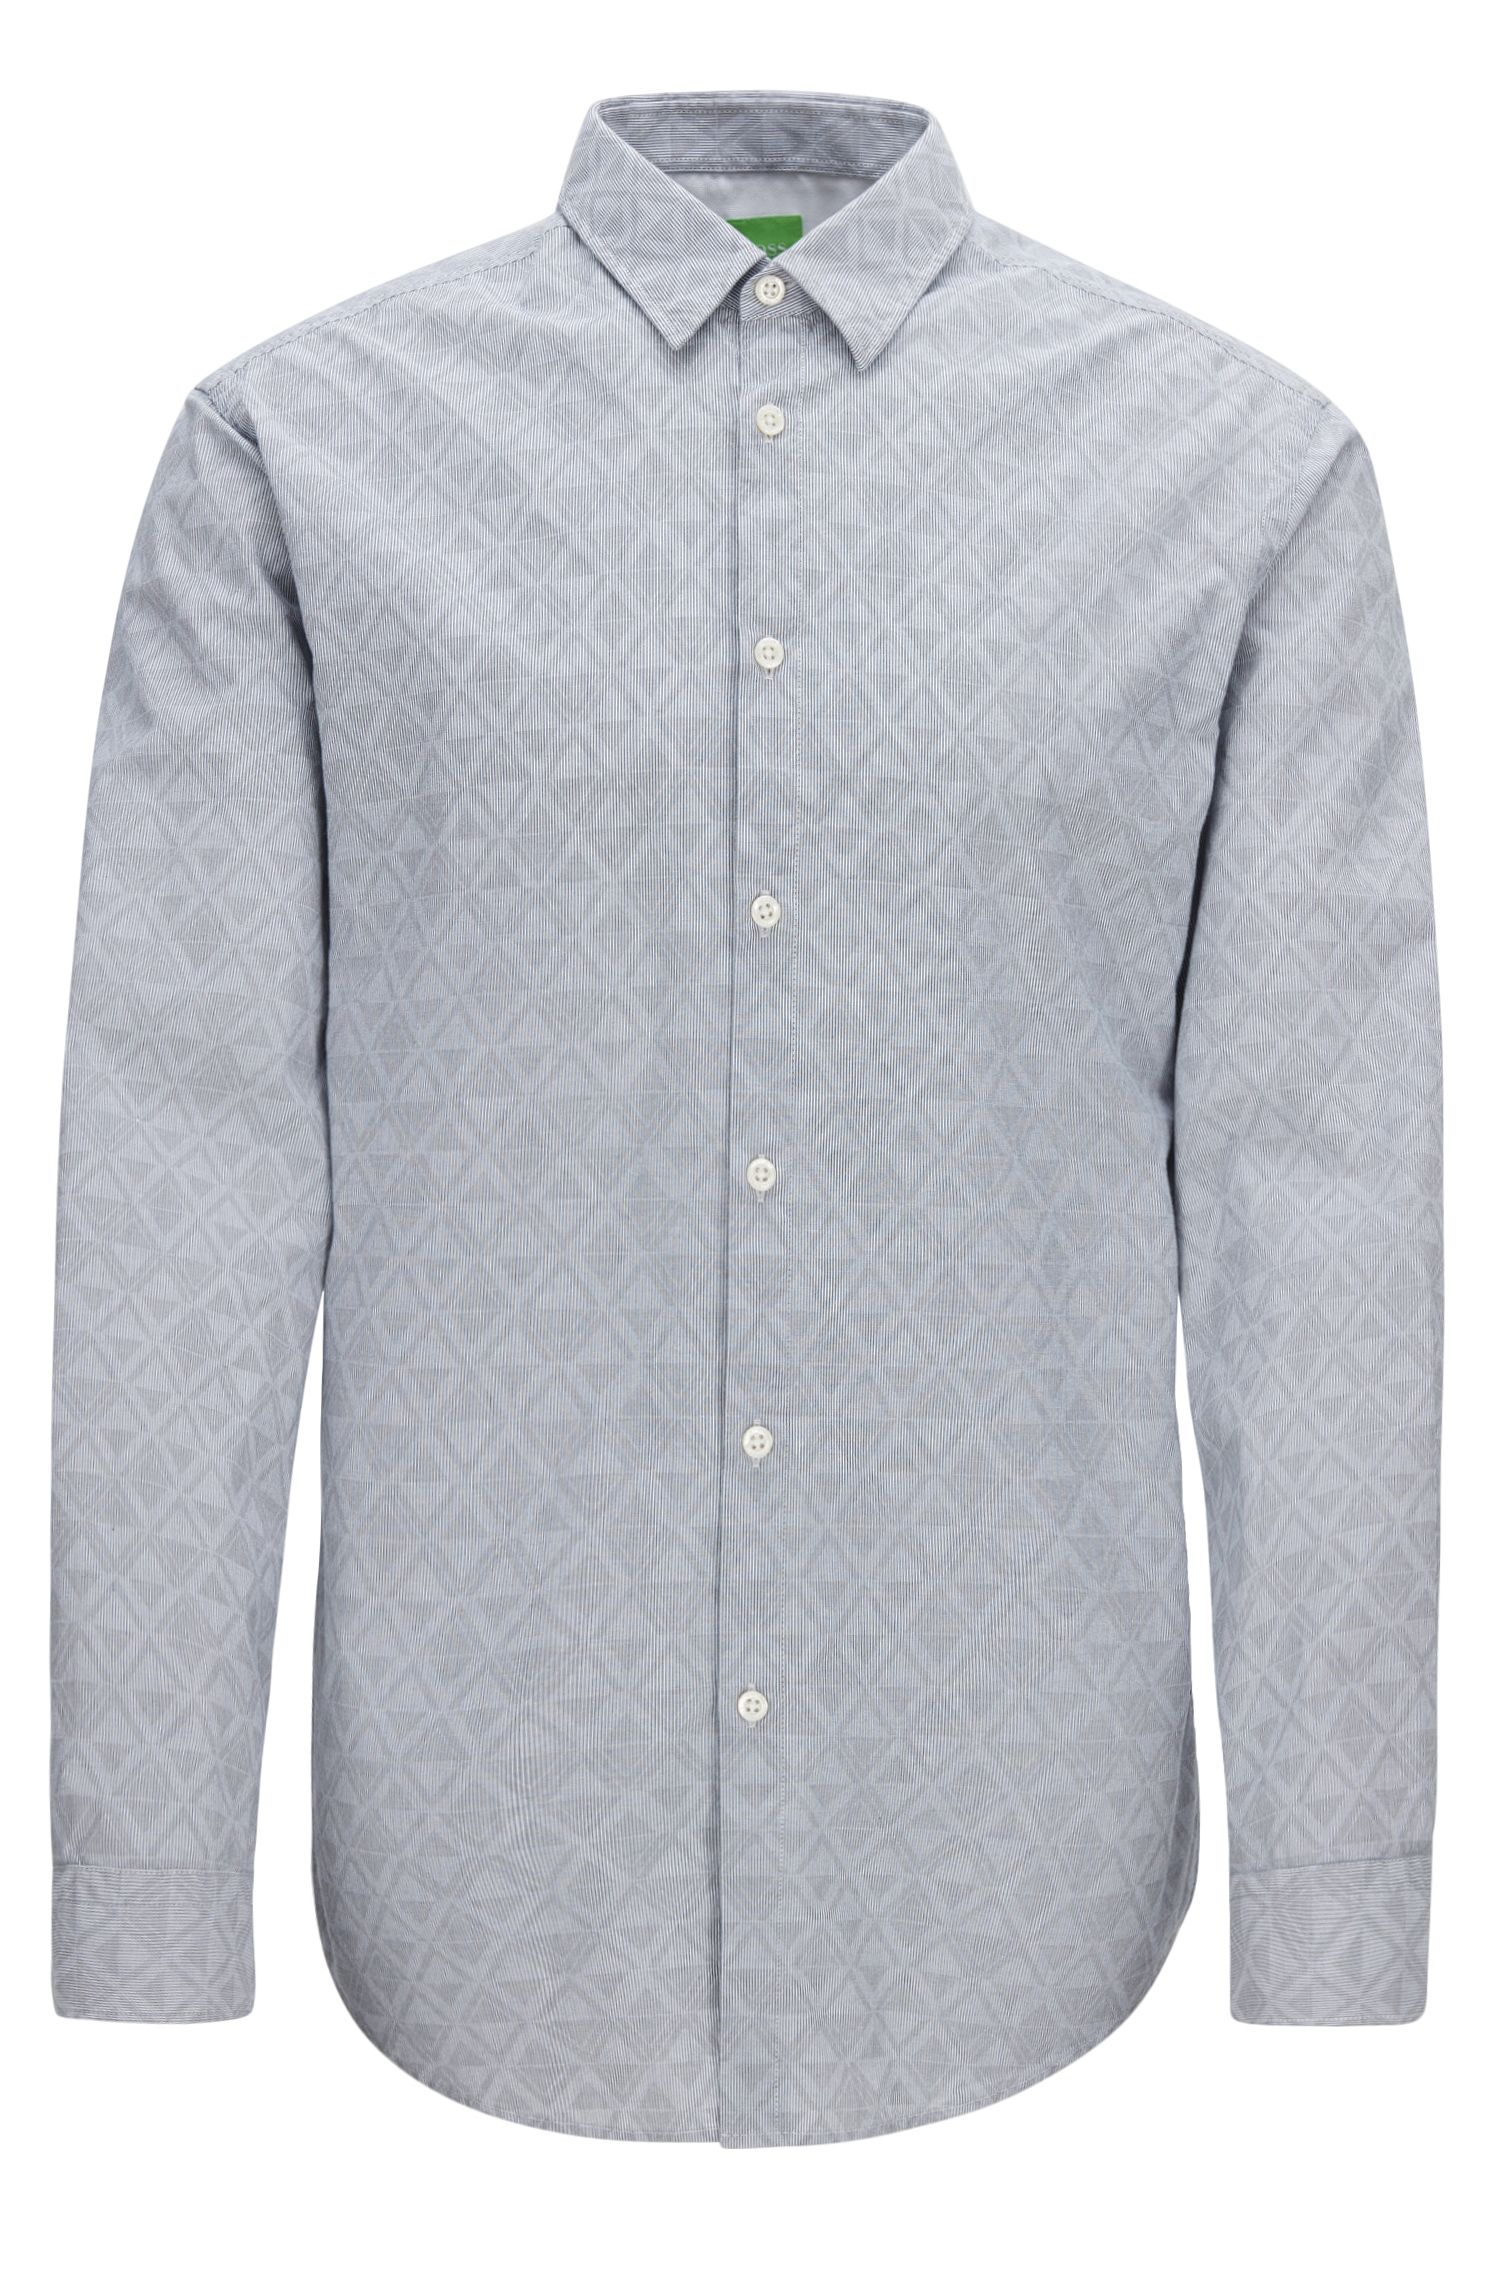 'C-Bustai R' | Regular Fit, Diamond Print Cotton Button Down Shirt